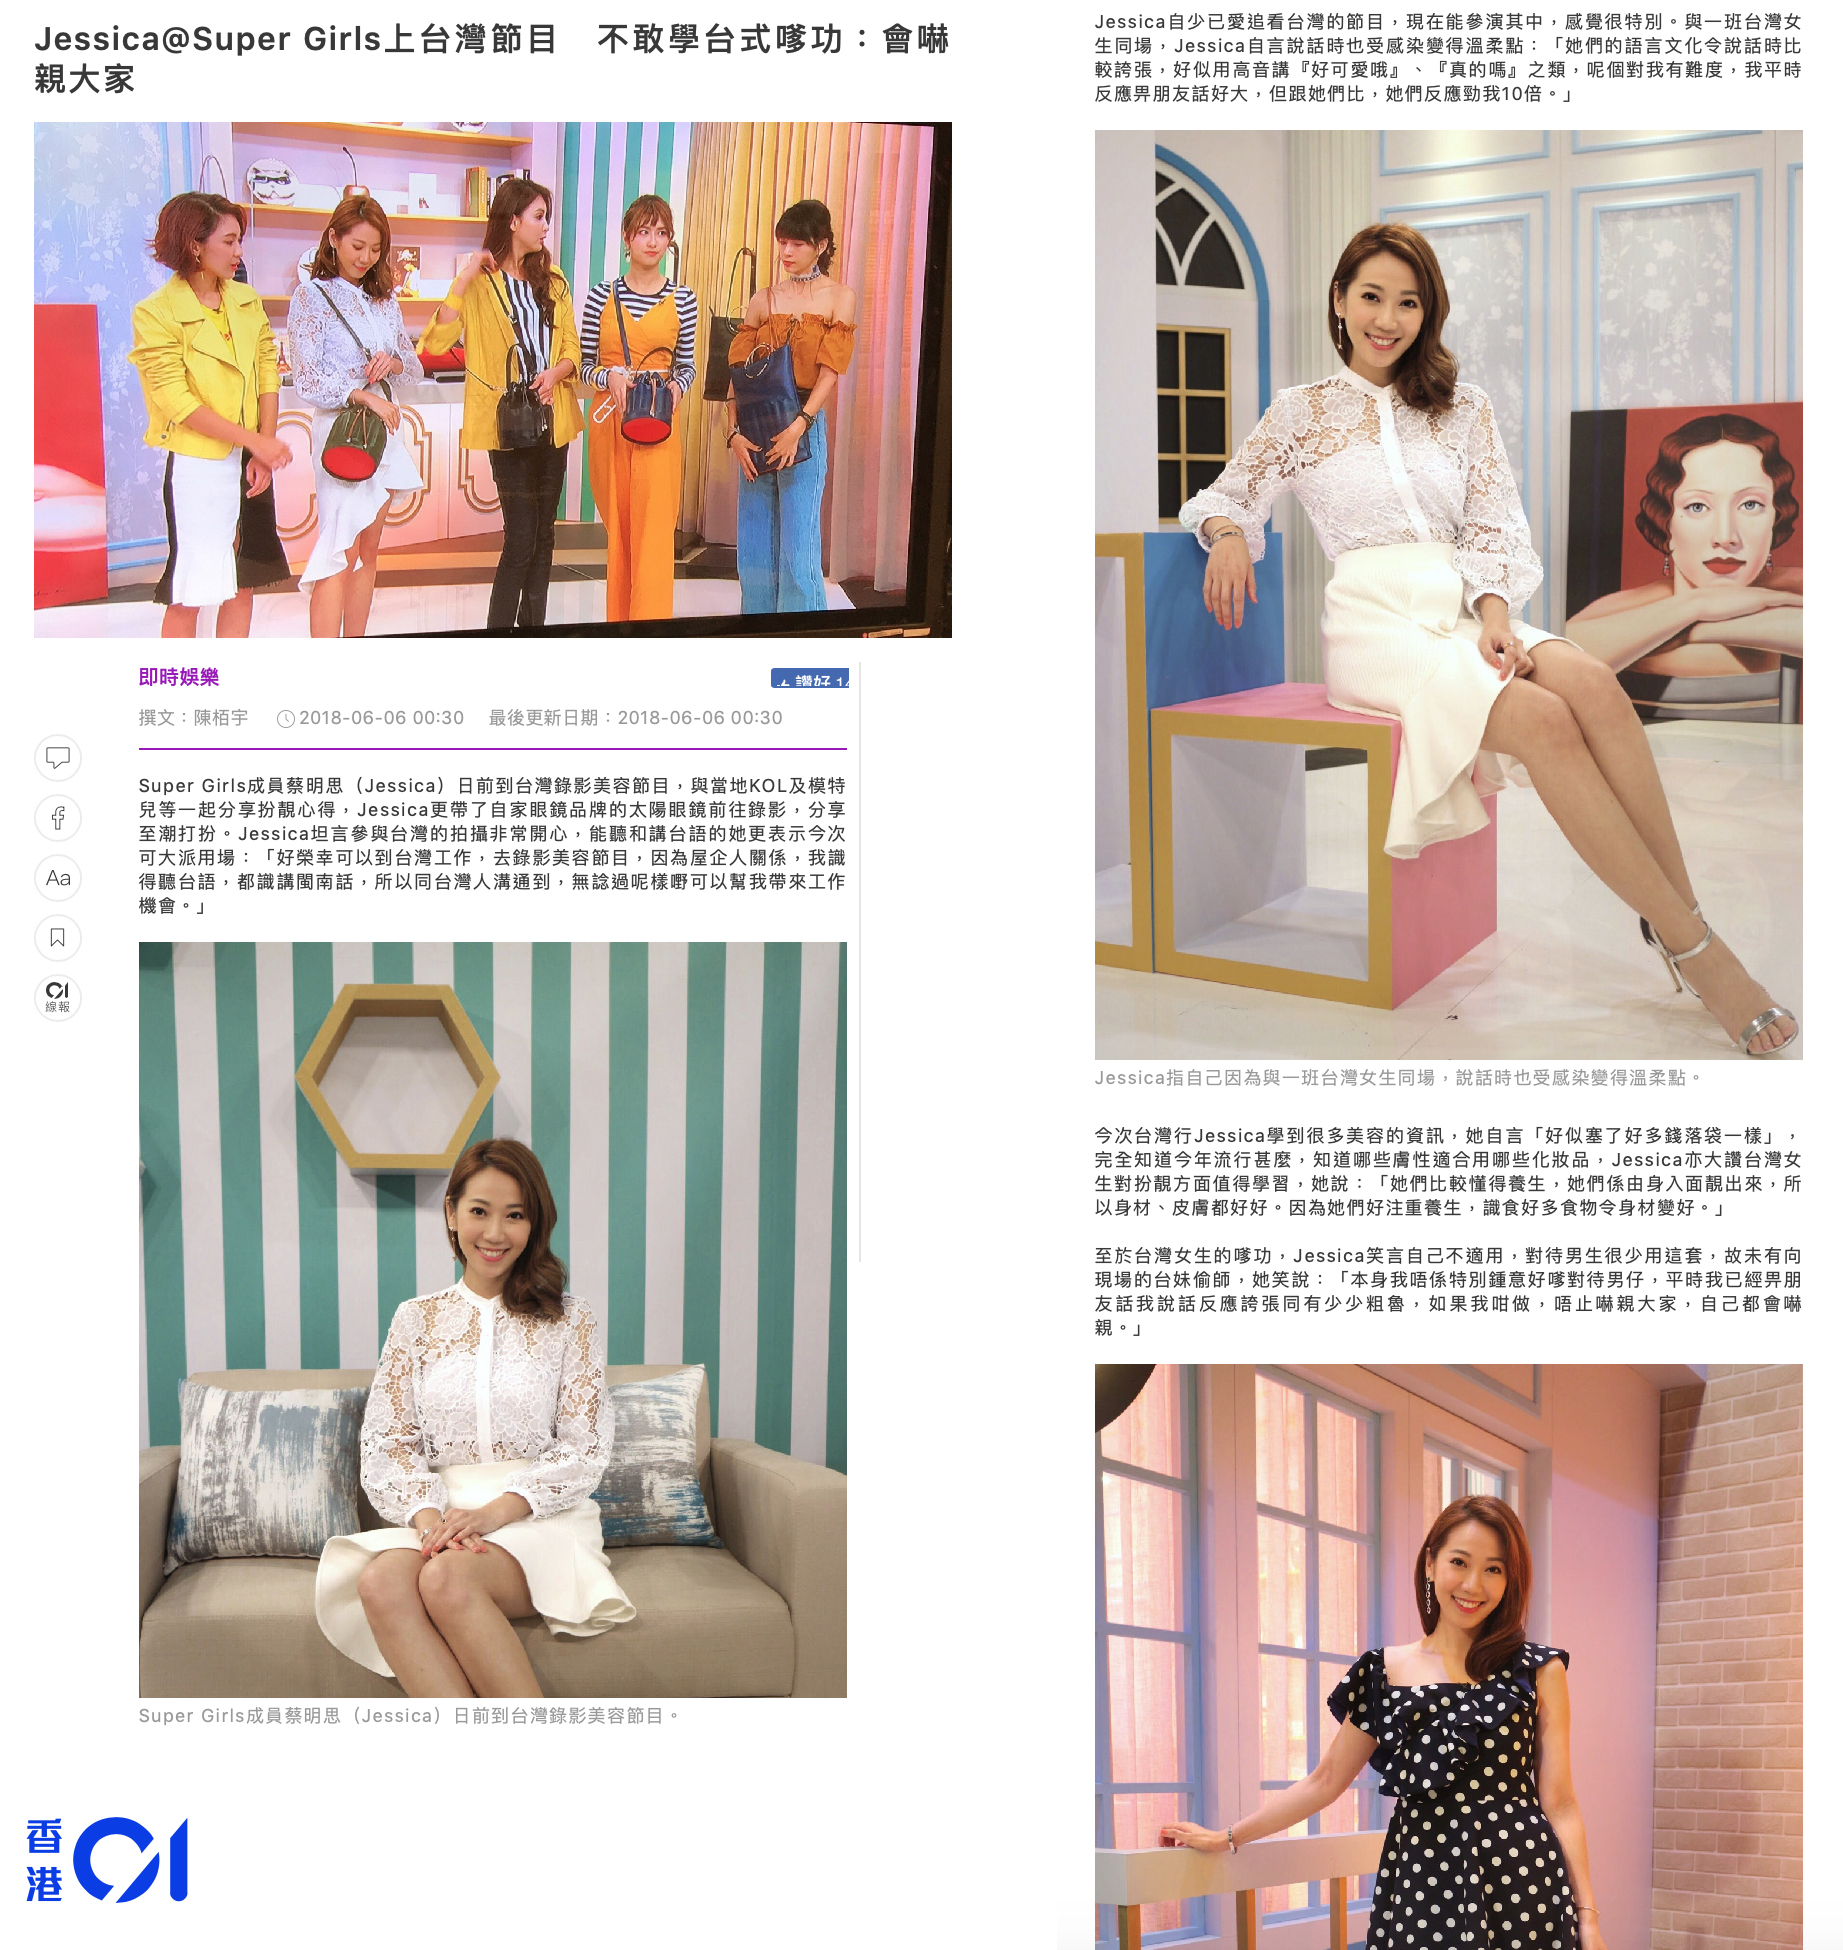 20180606 JessicaTsoi HK01